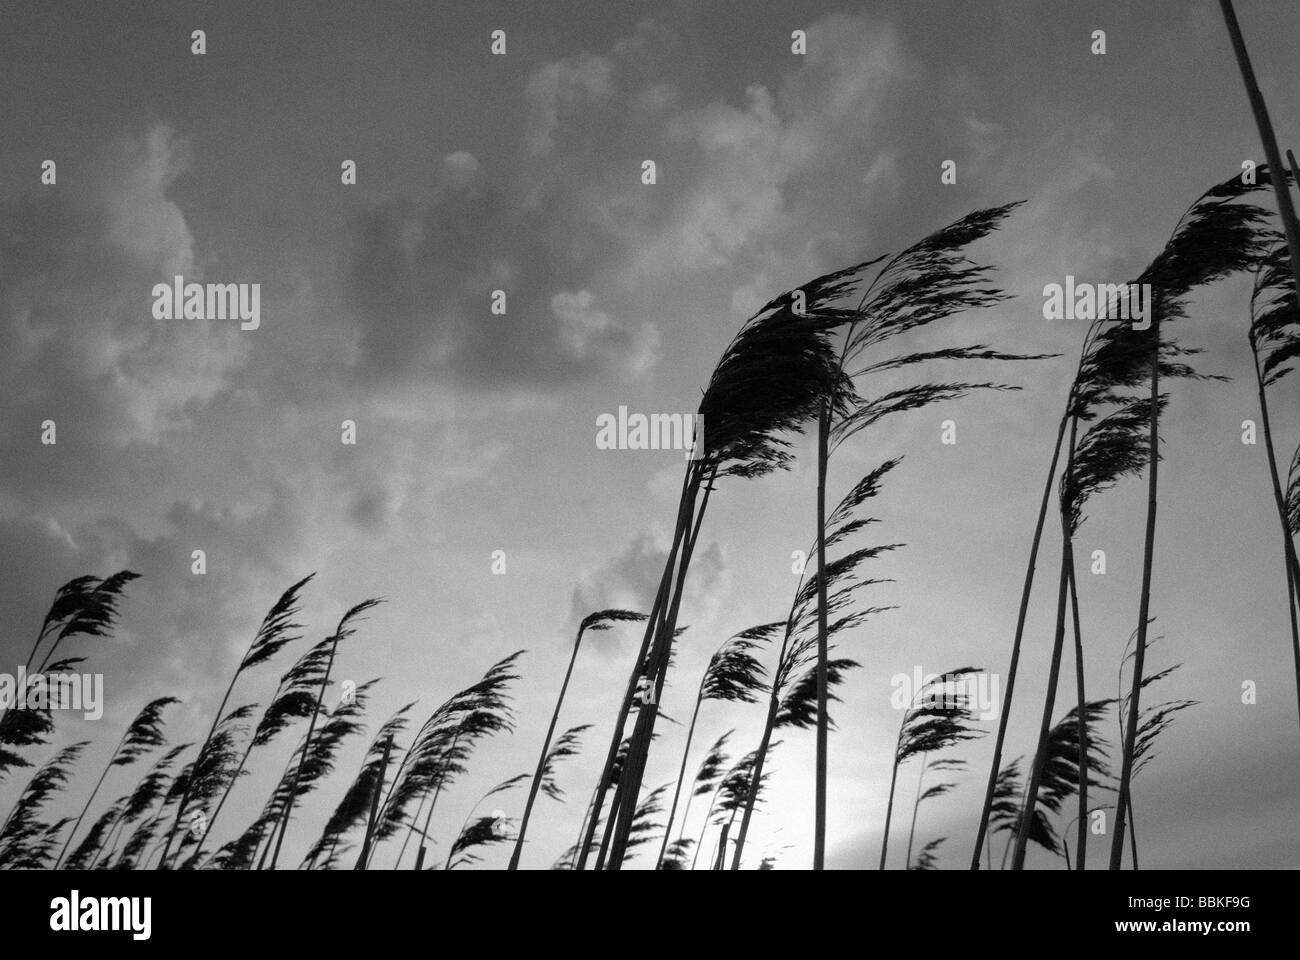 BEACH GRASS - Stock Image